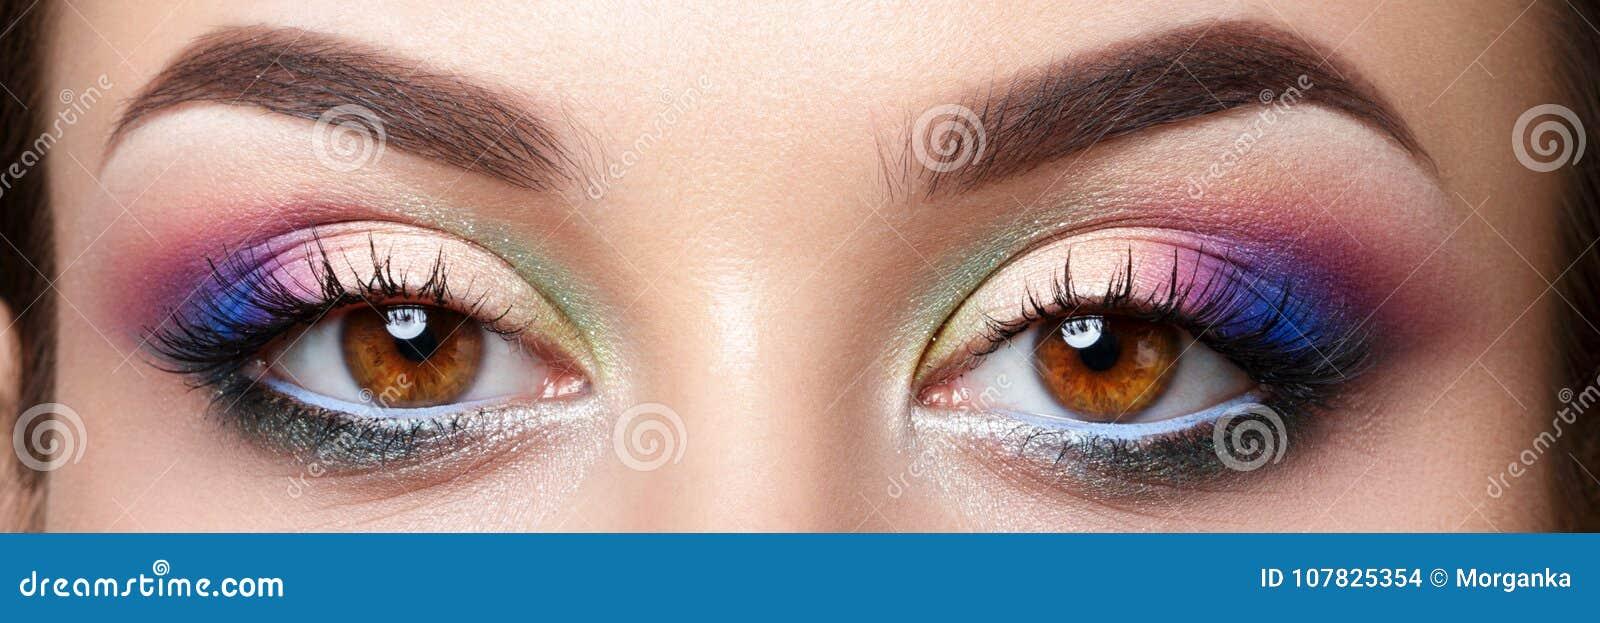 Closeup View Of Woman Eyes With Evening Makeup Stock Photo Image